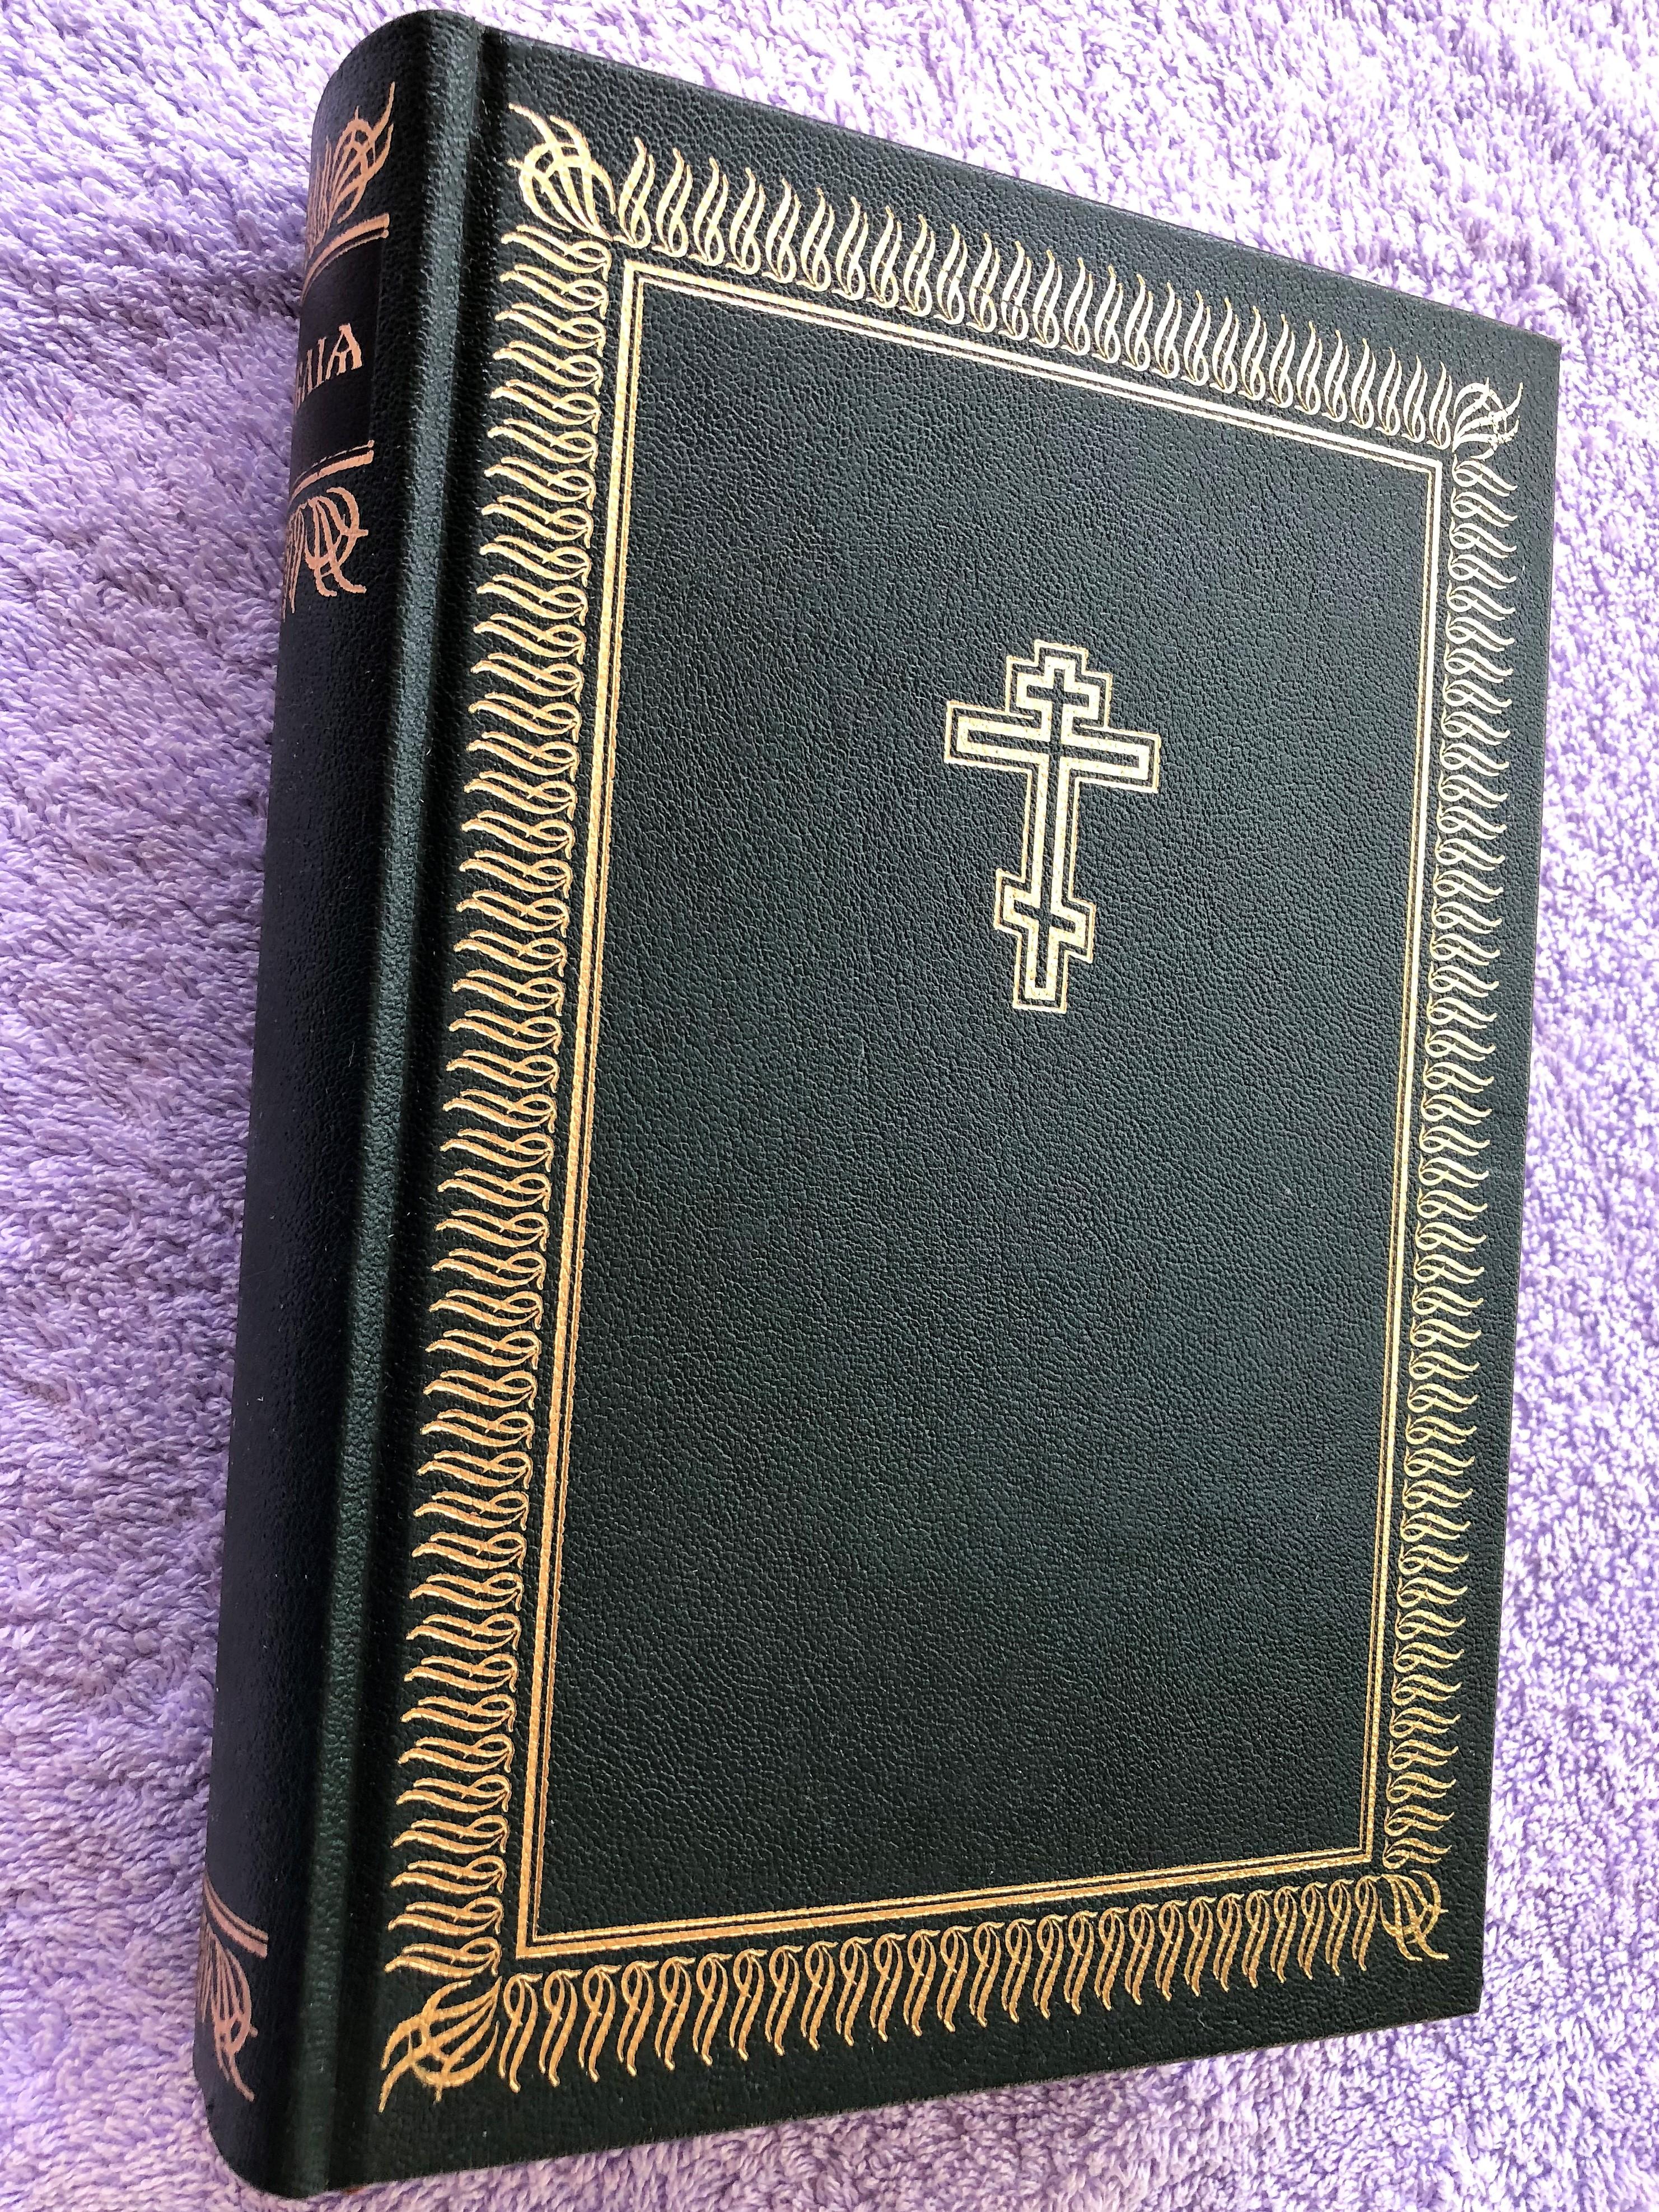 old-church-slavic-bible-beautiful-luxury-leather-bound-bible-green-1-.jpg